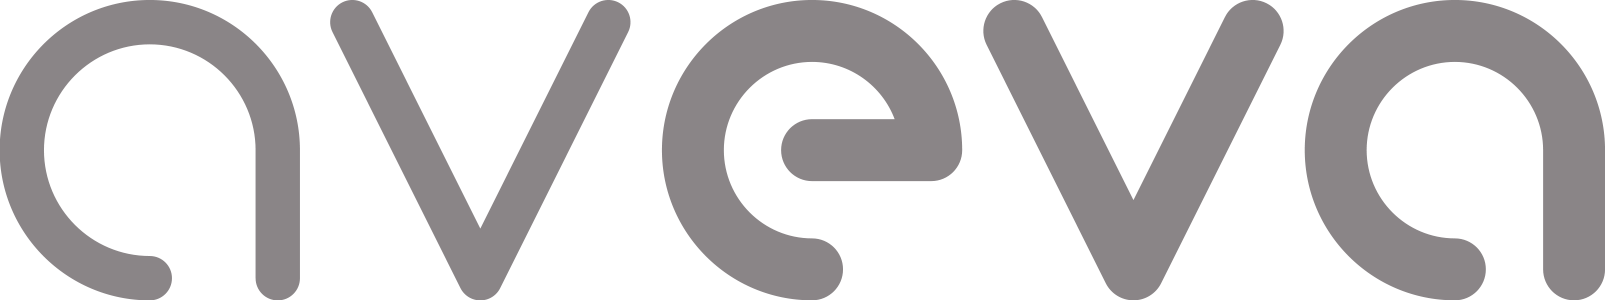 aveva-design-logo